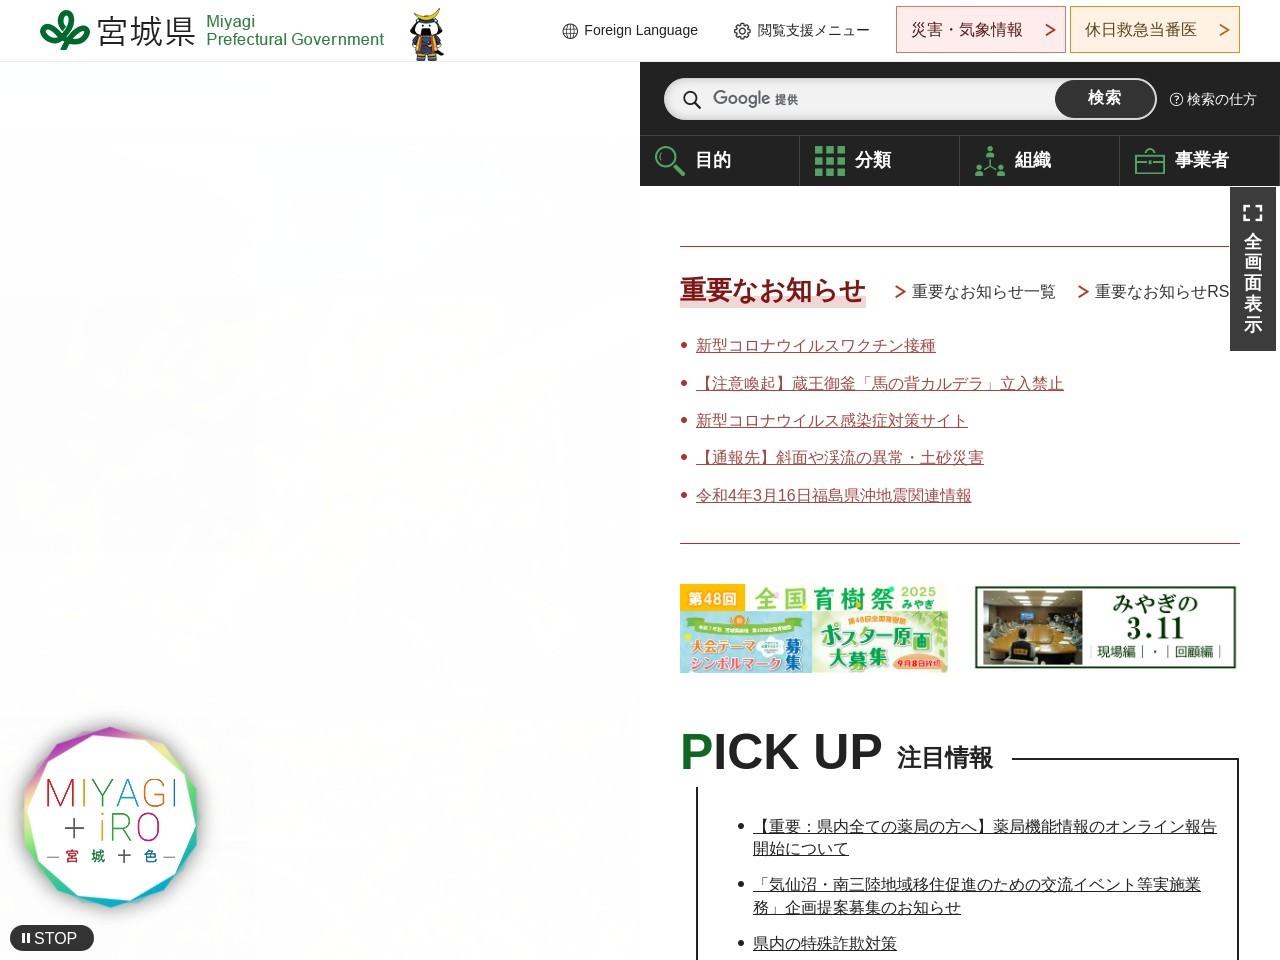 http://www.pref.miyagi.jp/site/event/nabe-2015.html